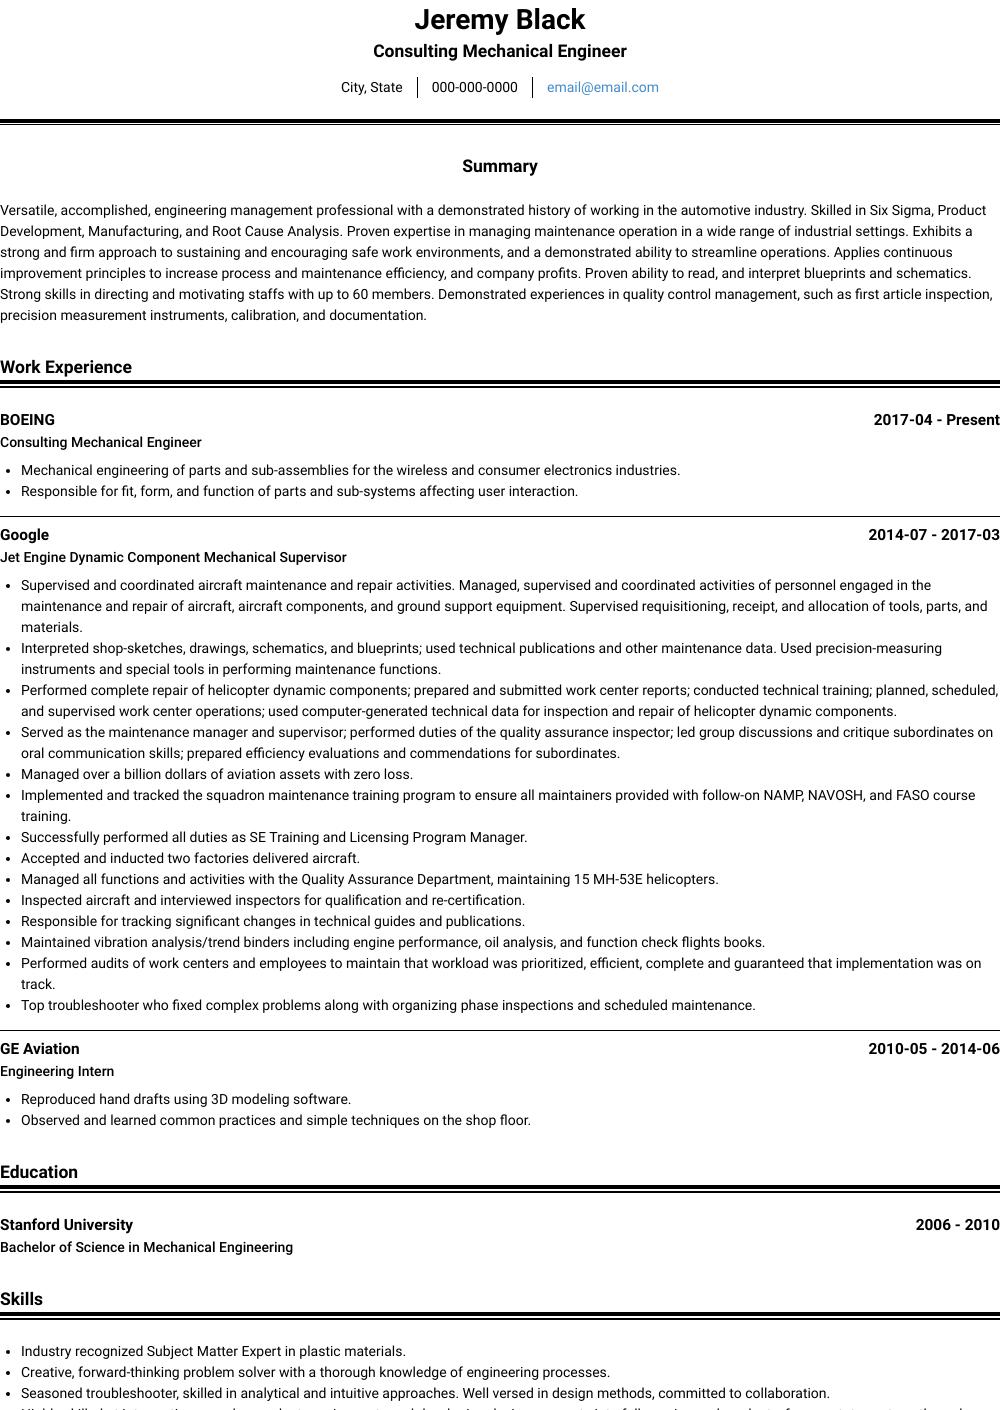 Mechanical Engineer Resume Samples & Templates